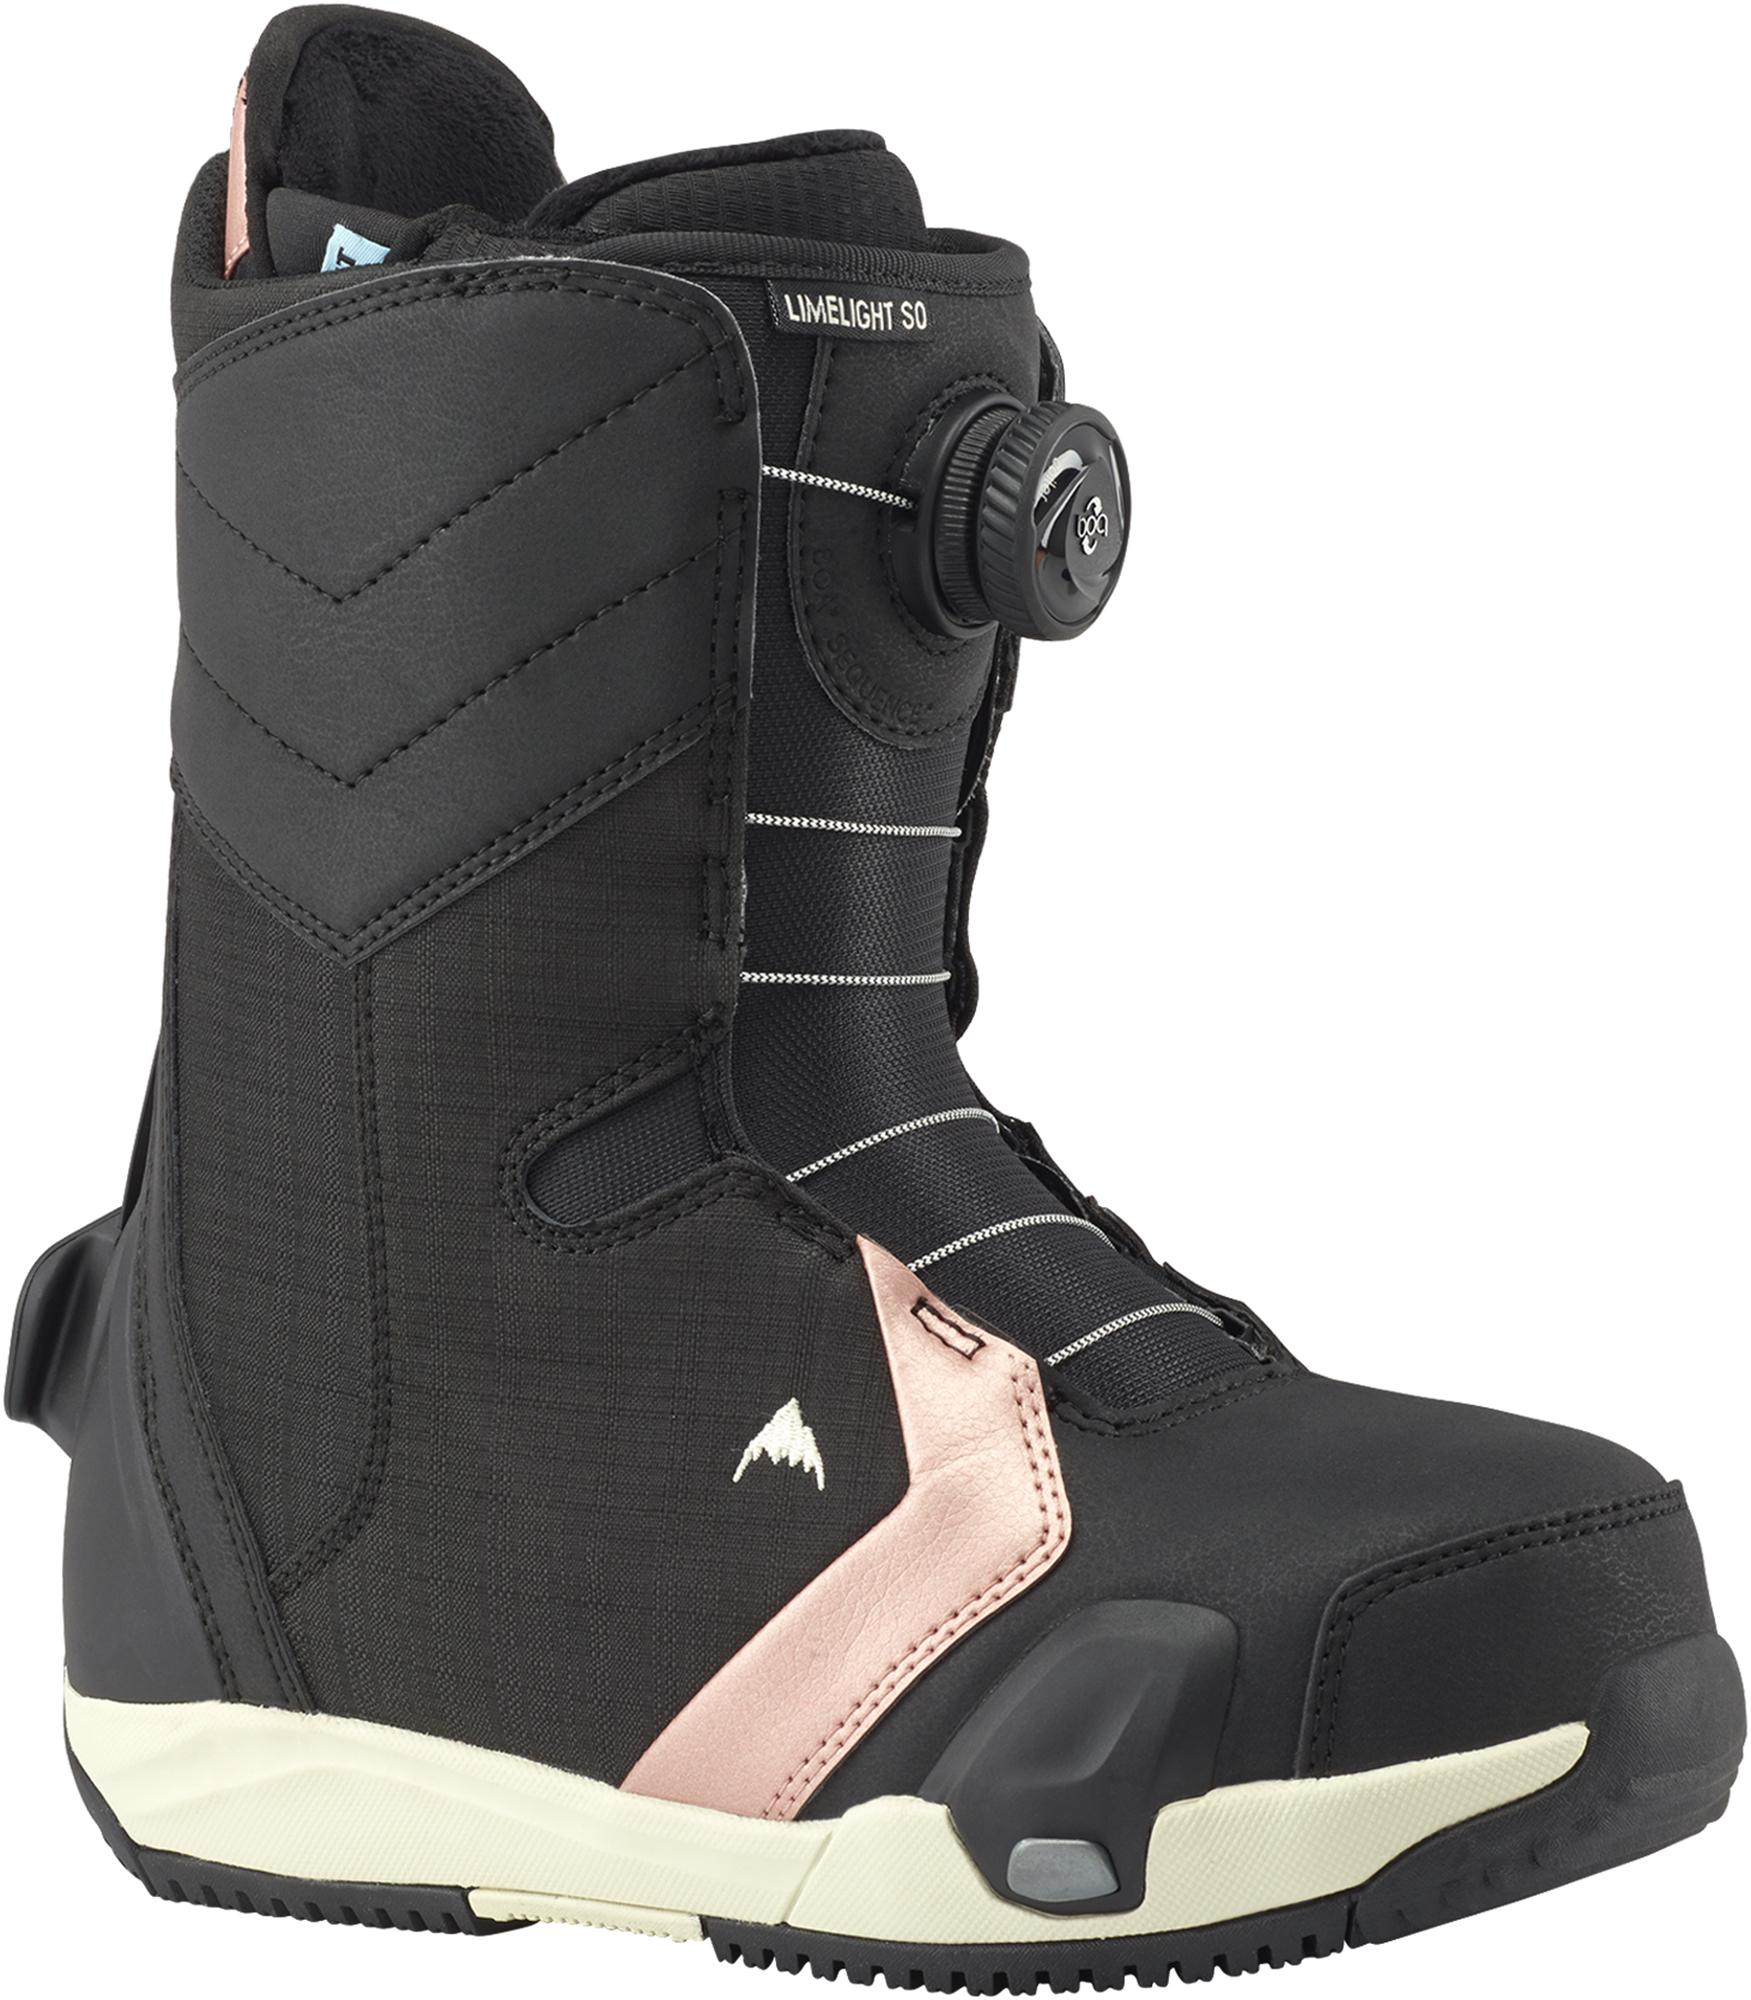 Burton Сноубордические ботинки женские Limelight Step On, размер 36,5